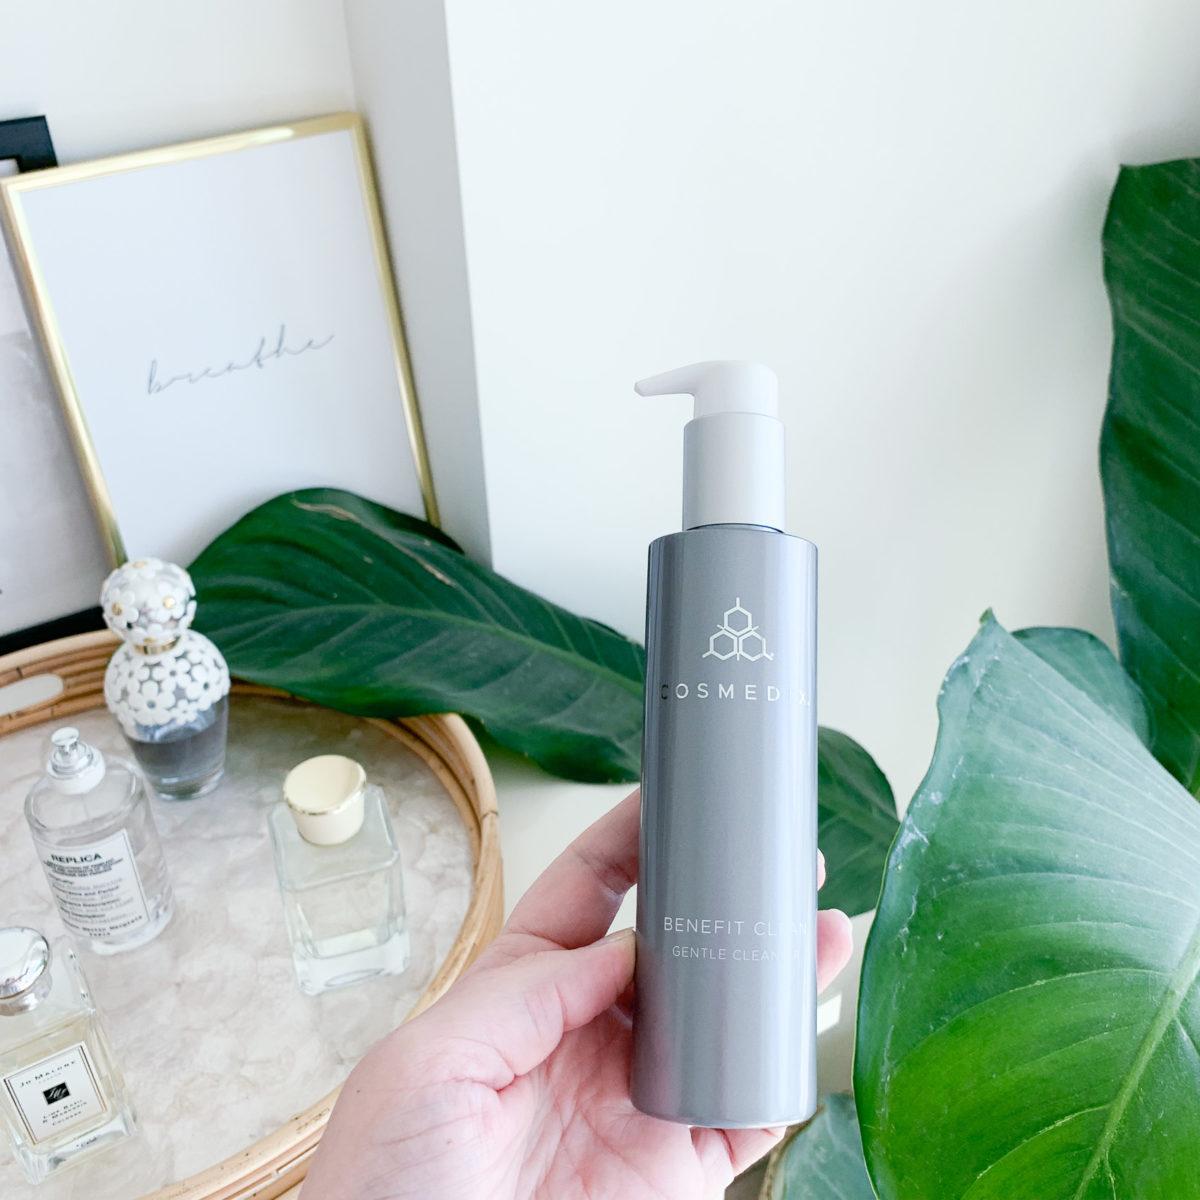 Cosmedix Benefit Clean Gentle Cleanser - Claire Baker